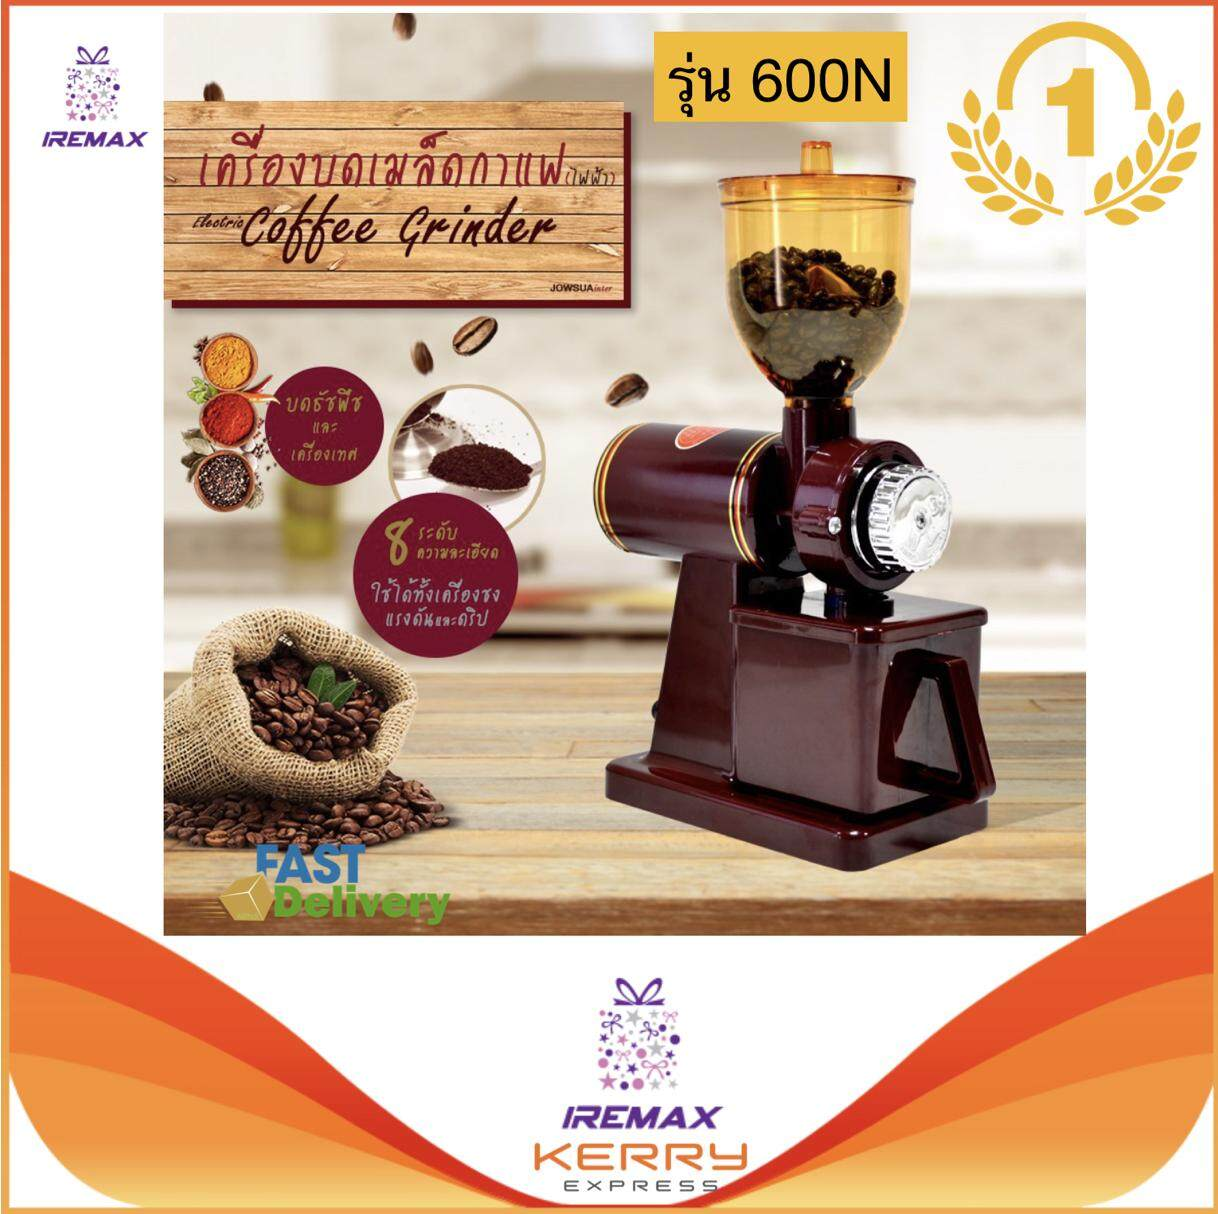 iRemax เครื่องบดกาแฟ เมล็ดกาแฟสด เครื่องบดเมล็ดกาแฟ รุ่น Coffee Grinder 600N